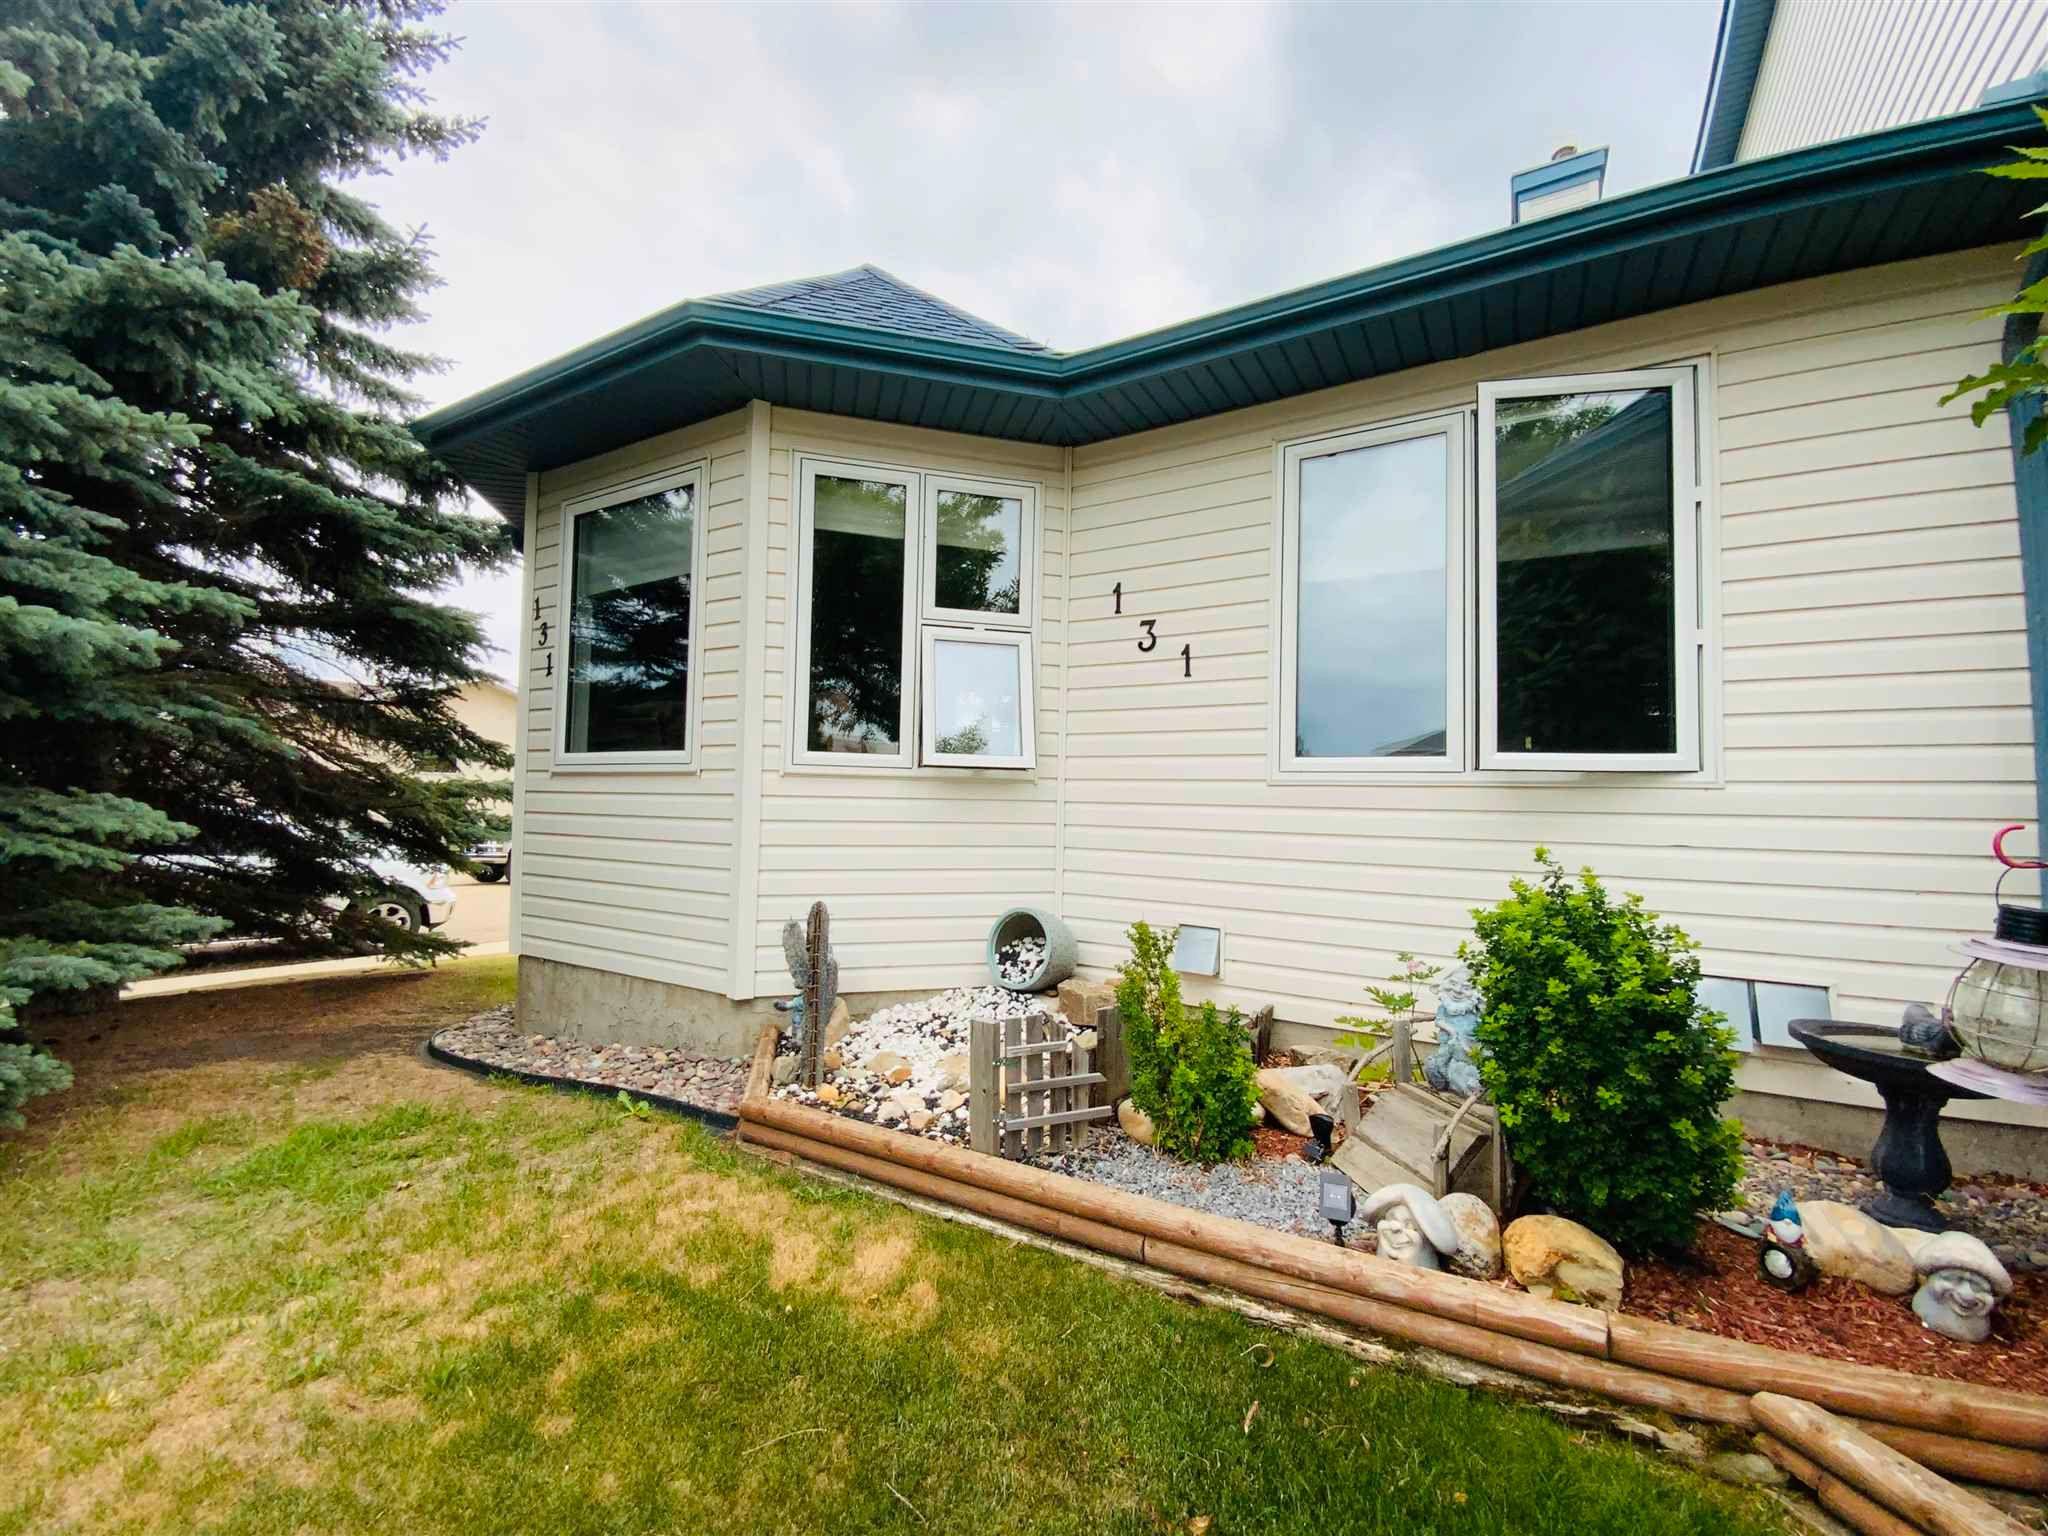 Main Photo: 131 Parkside Drive: Wetaskiwin House Half Duplex for sale : MLS®# E4253062